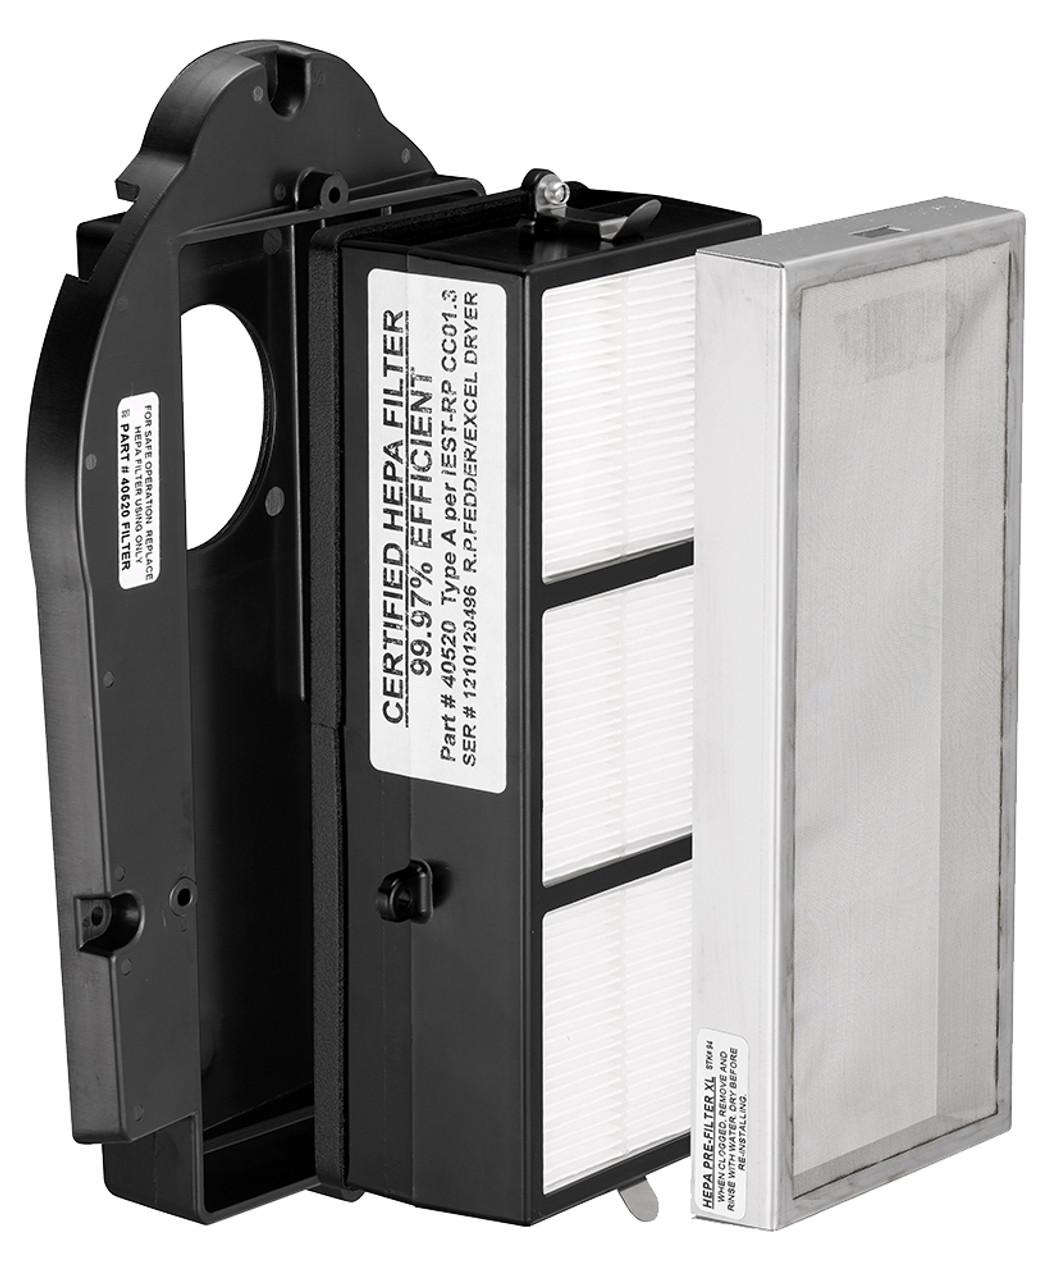 XLERATOR Hand Dryer HEPA Filter Retrofit Kit, XL-40525 on